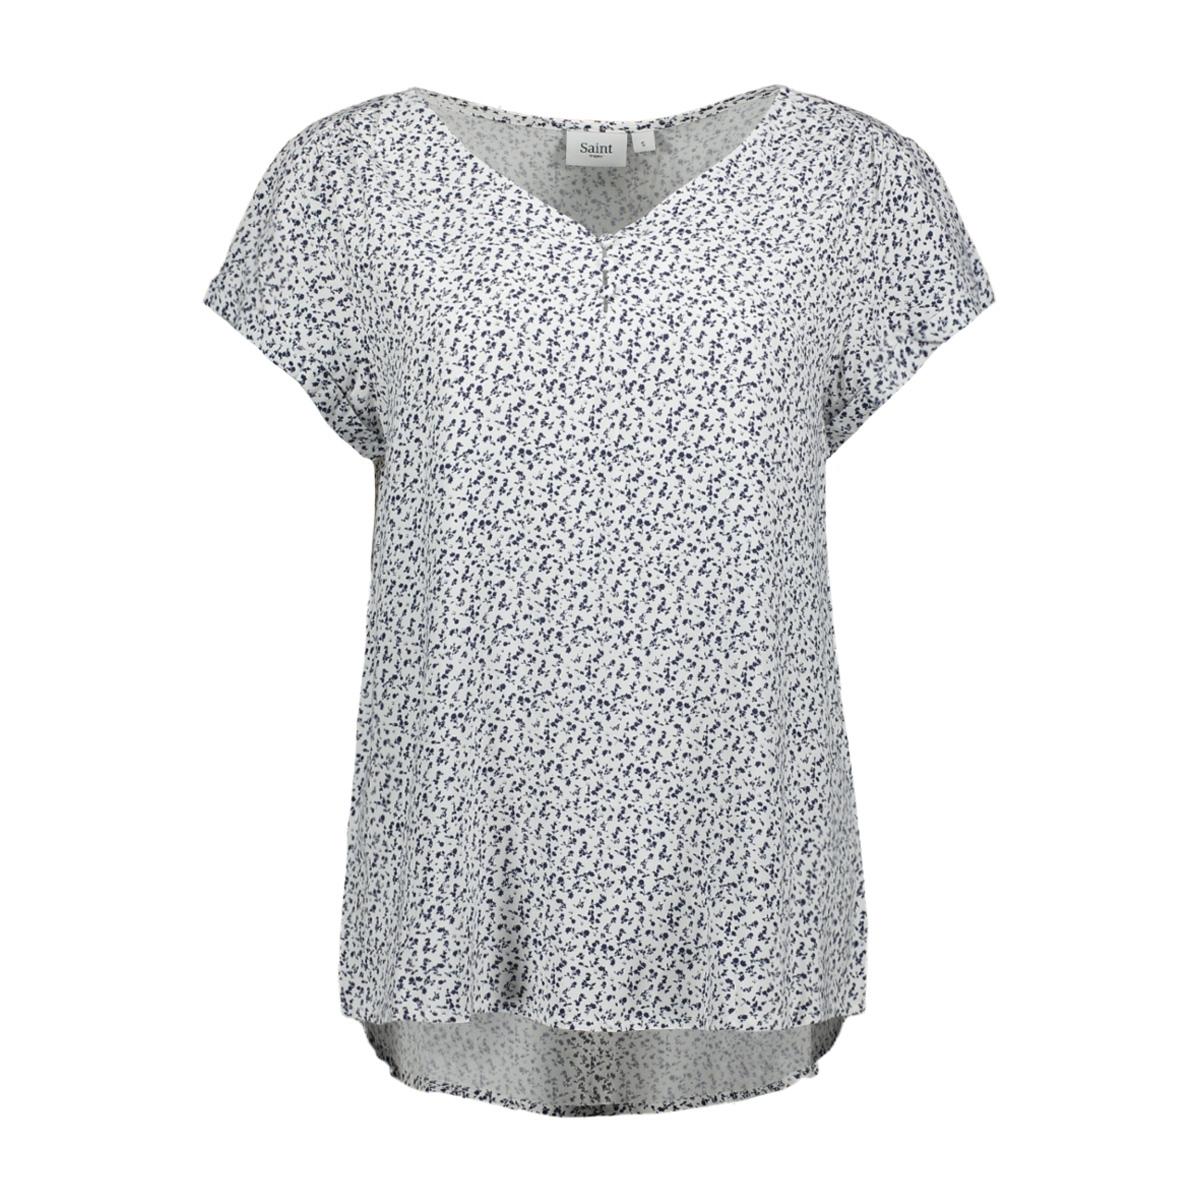 daisy printed top t1069 saint tropez t-shirt 1053